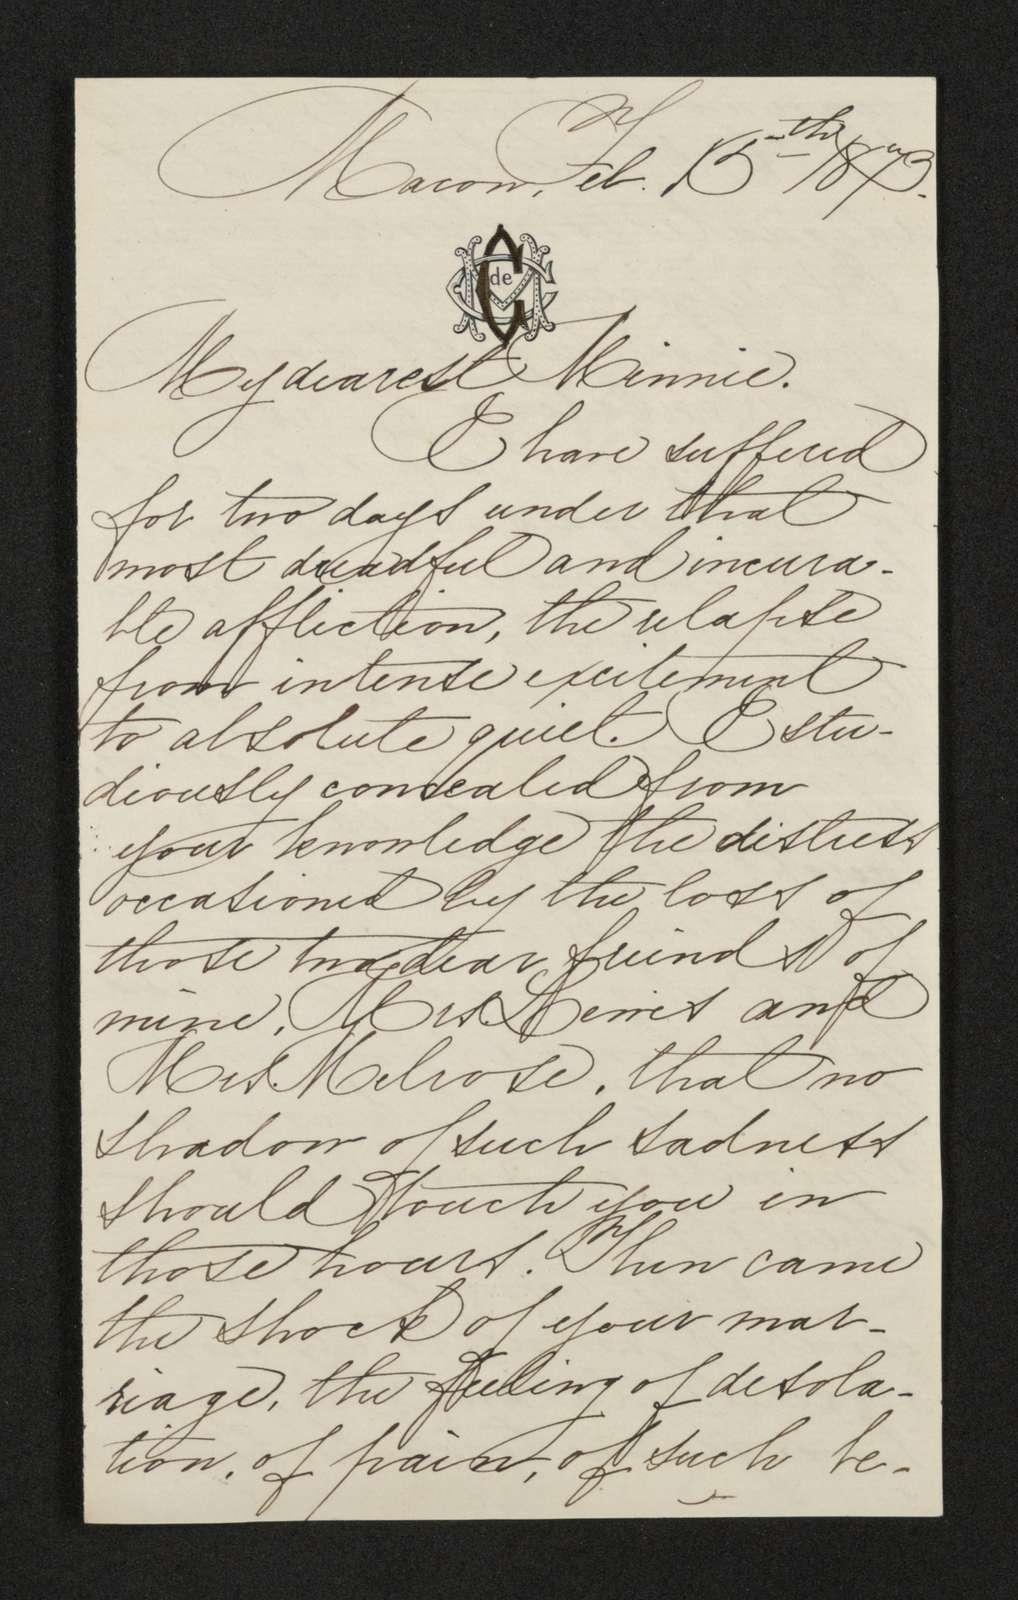 Lewis H. Machen Family Papers: Gresham Family Correspondence, 1834-1925; 1873-1874